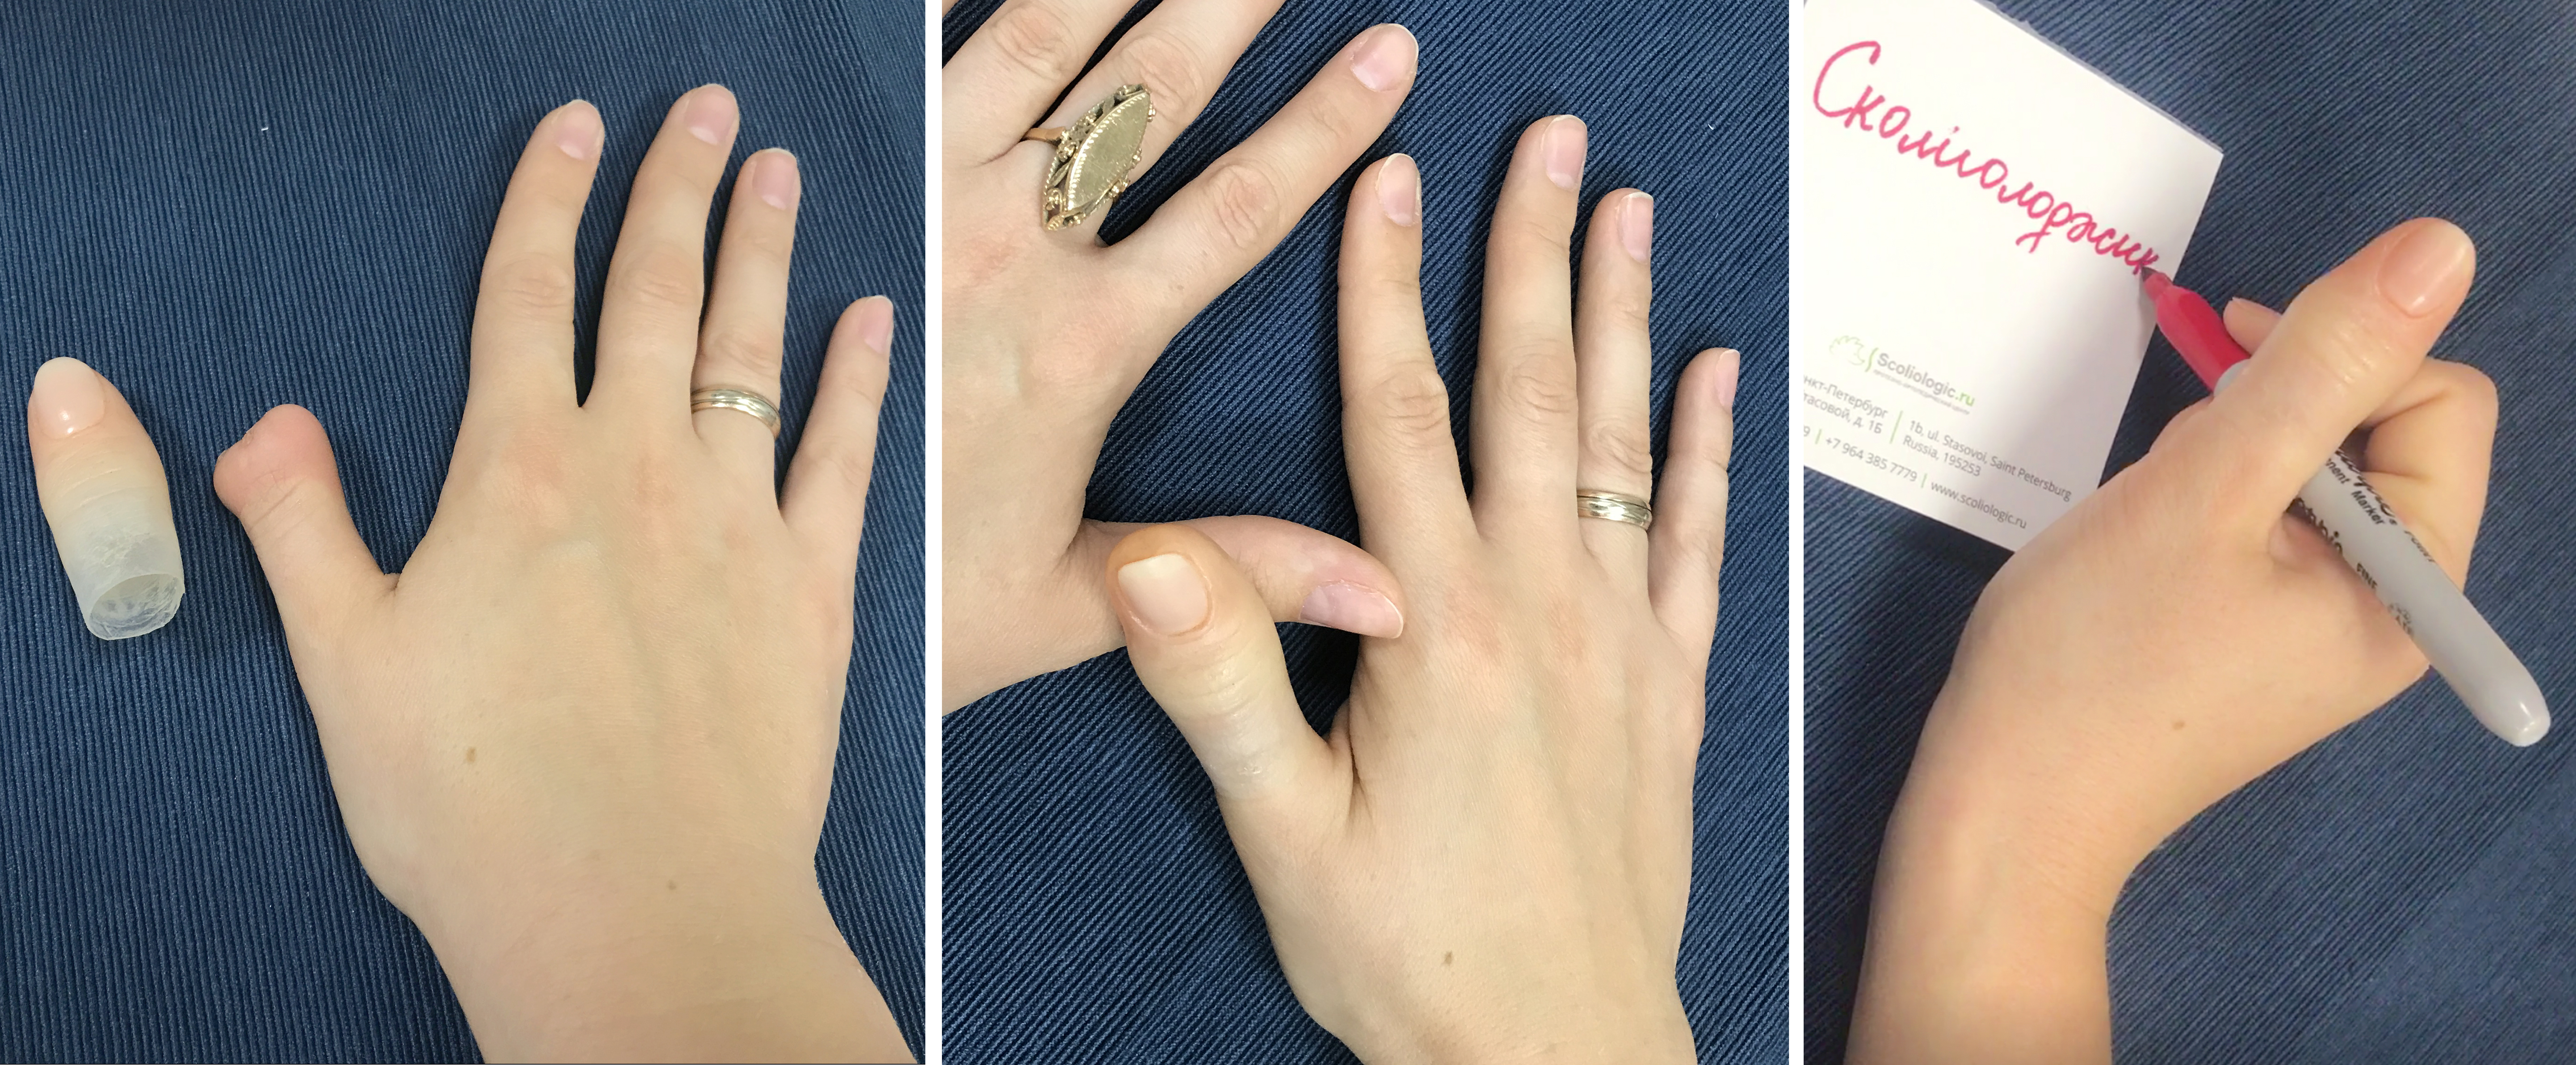 протез пальца